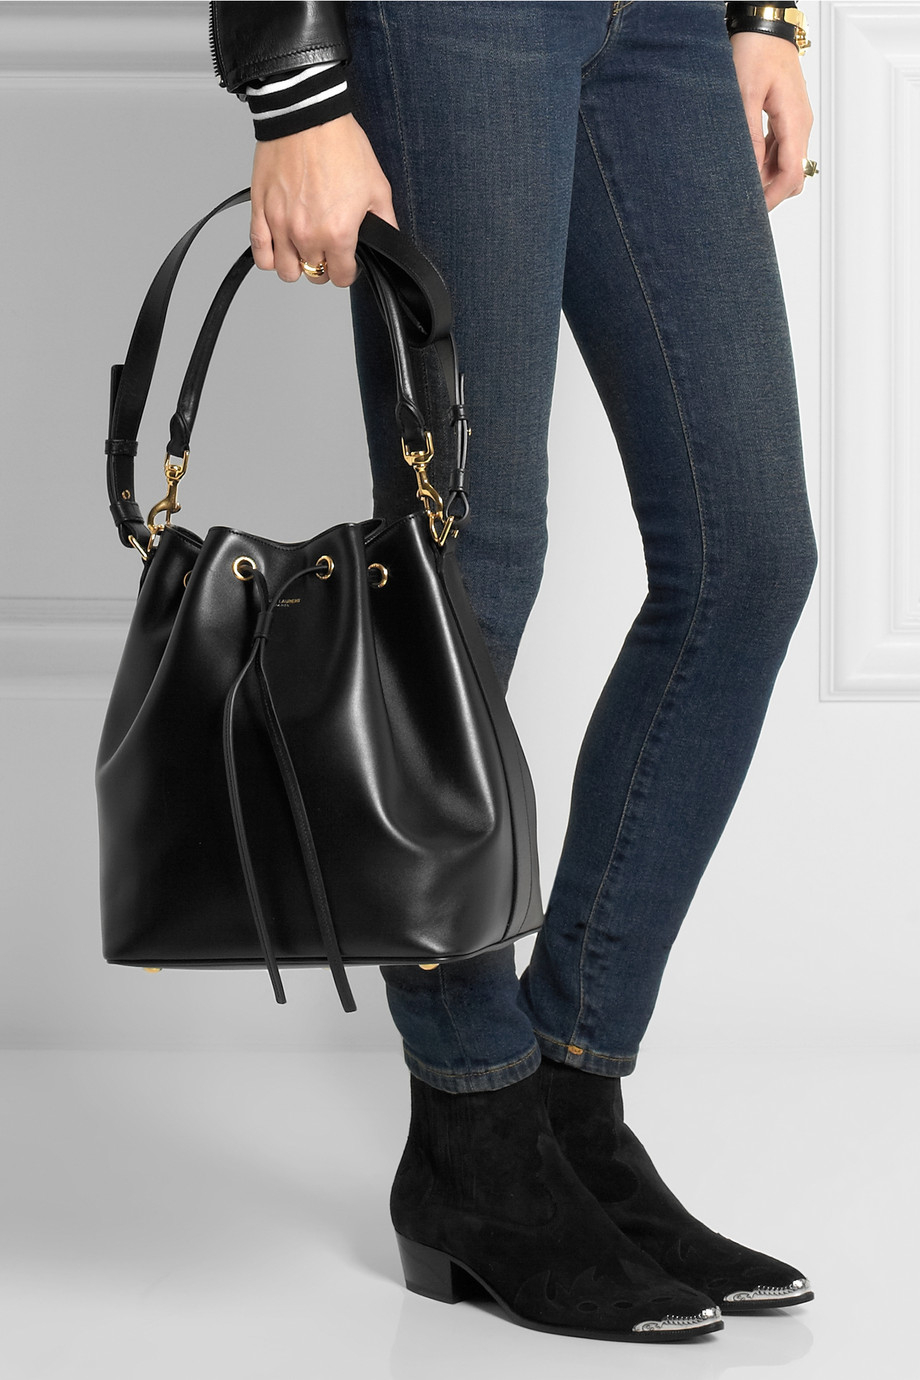 yves saint laurent leather handbag - yves saint laurent medium emmanuel bucket bag, yves saint laurent ...